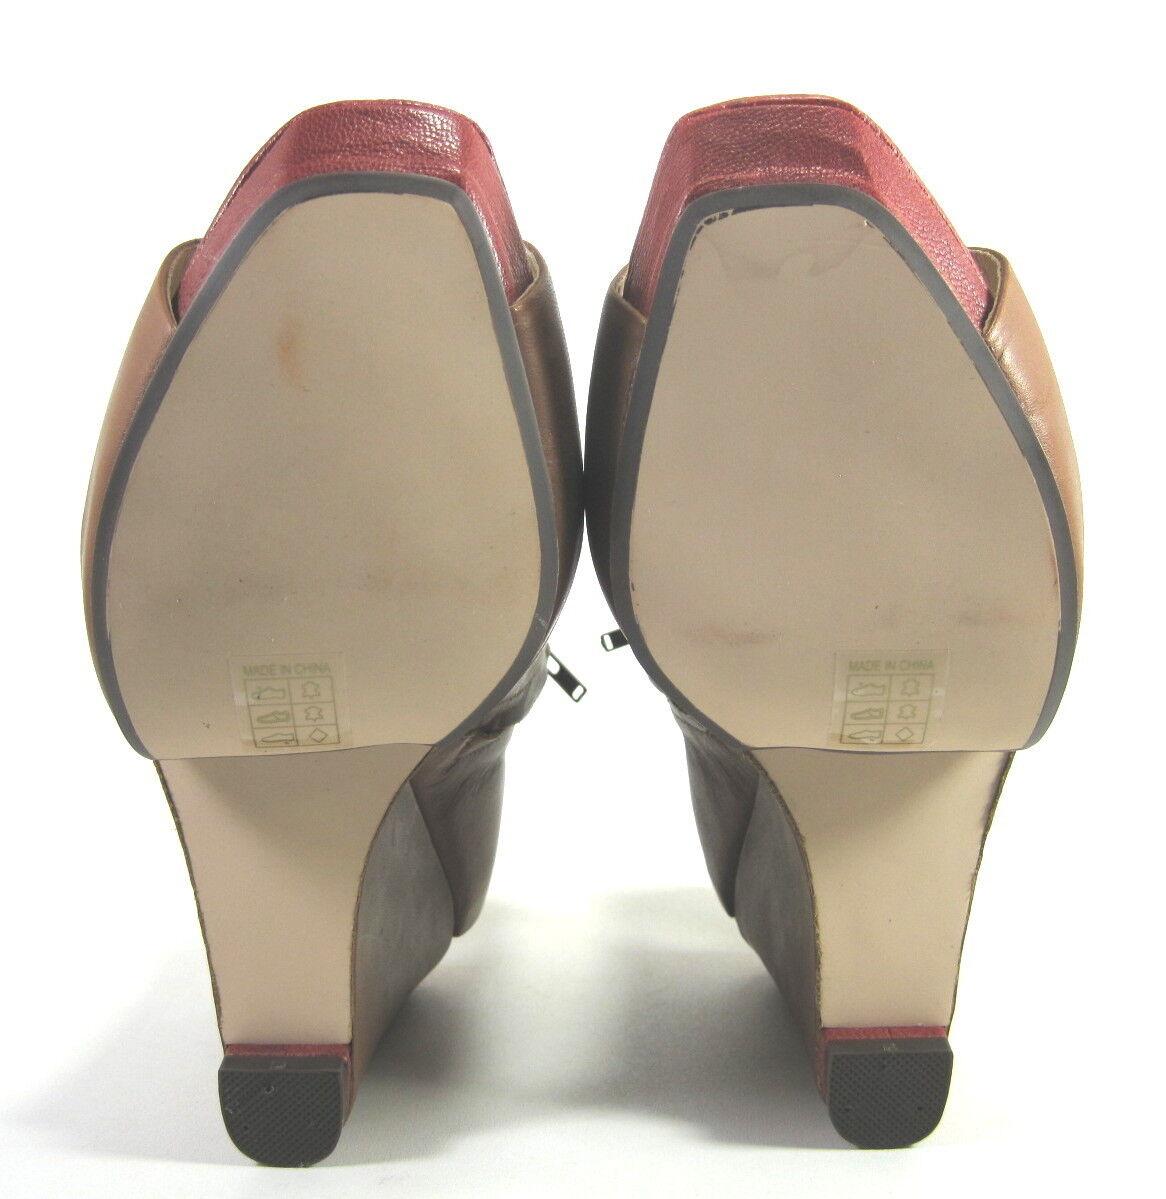 FARYLROBIN femmes  MADISON2    WEDGE SANDALS CUOIO2 LEATHER US Taille 9 MEDIUM (B)M d3773e